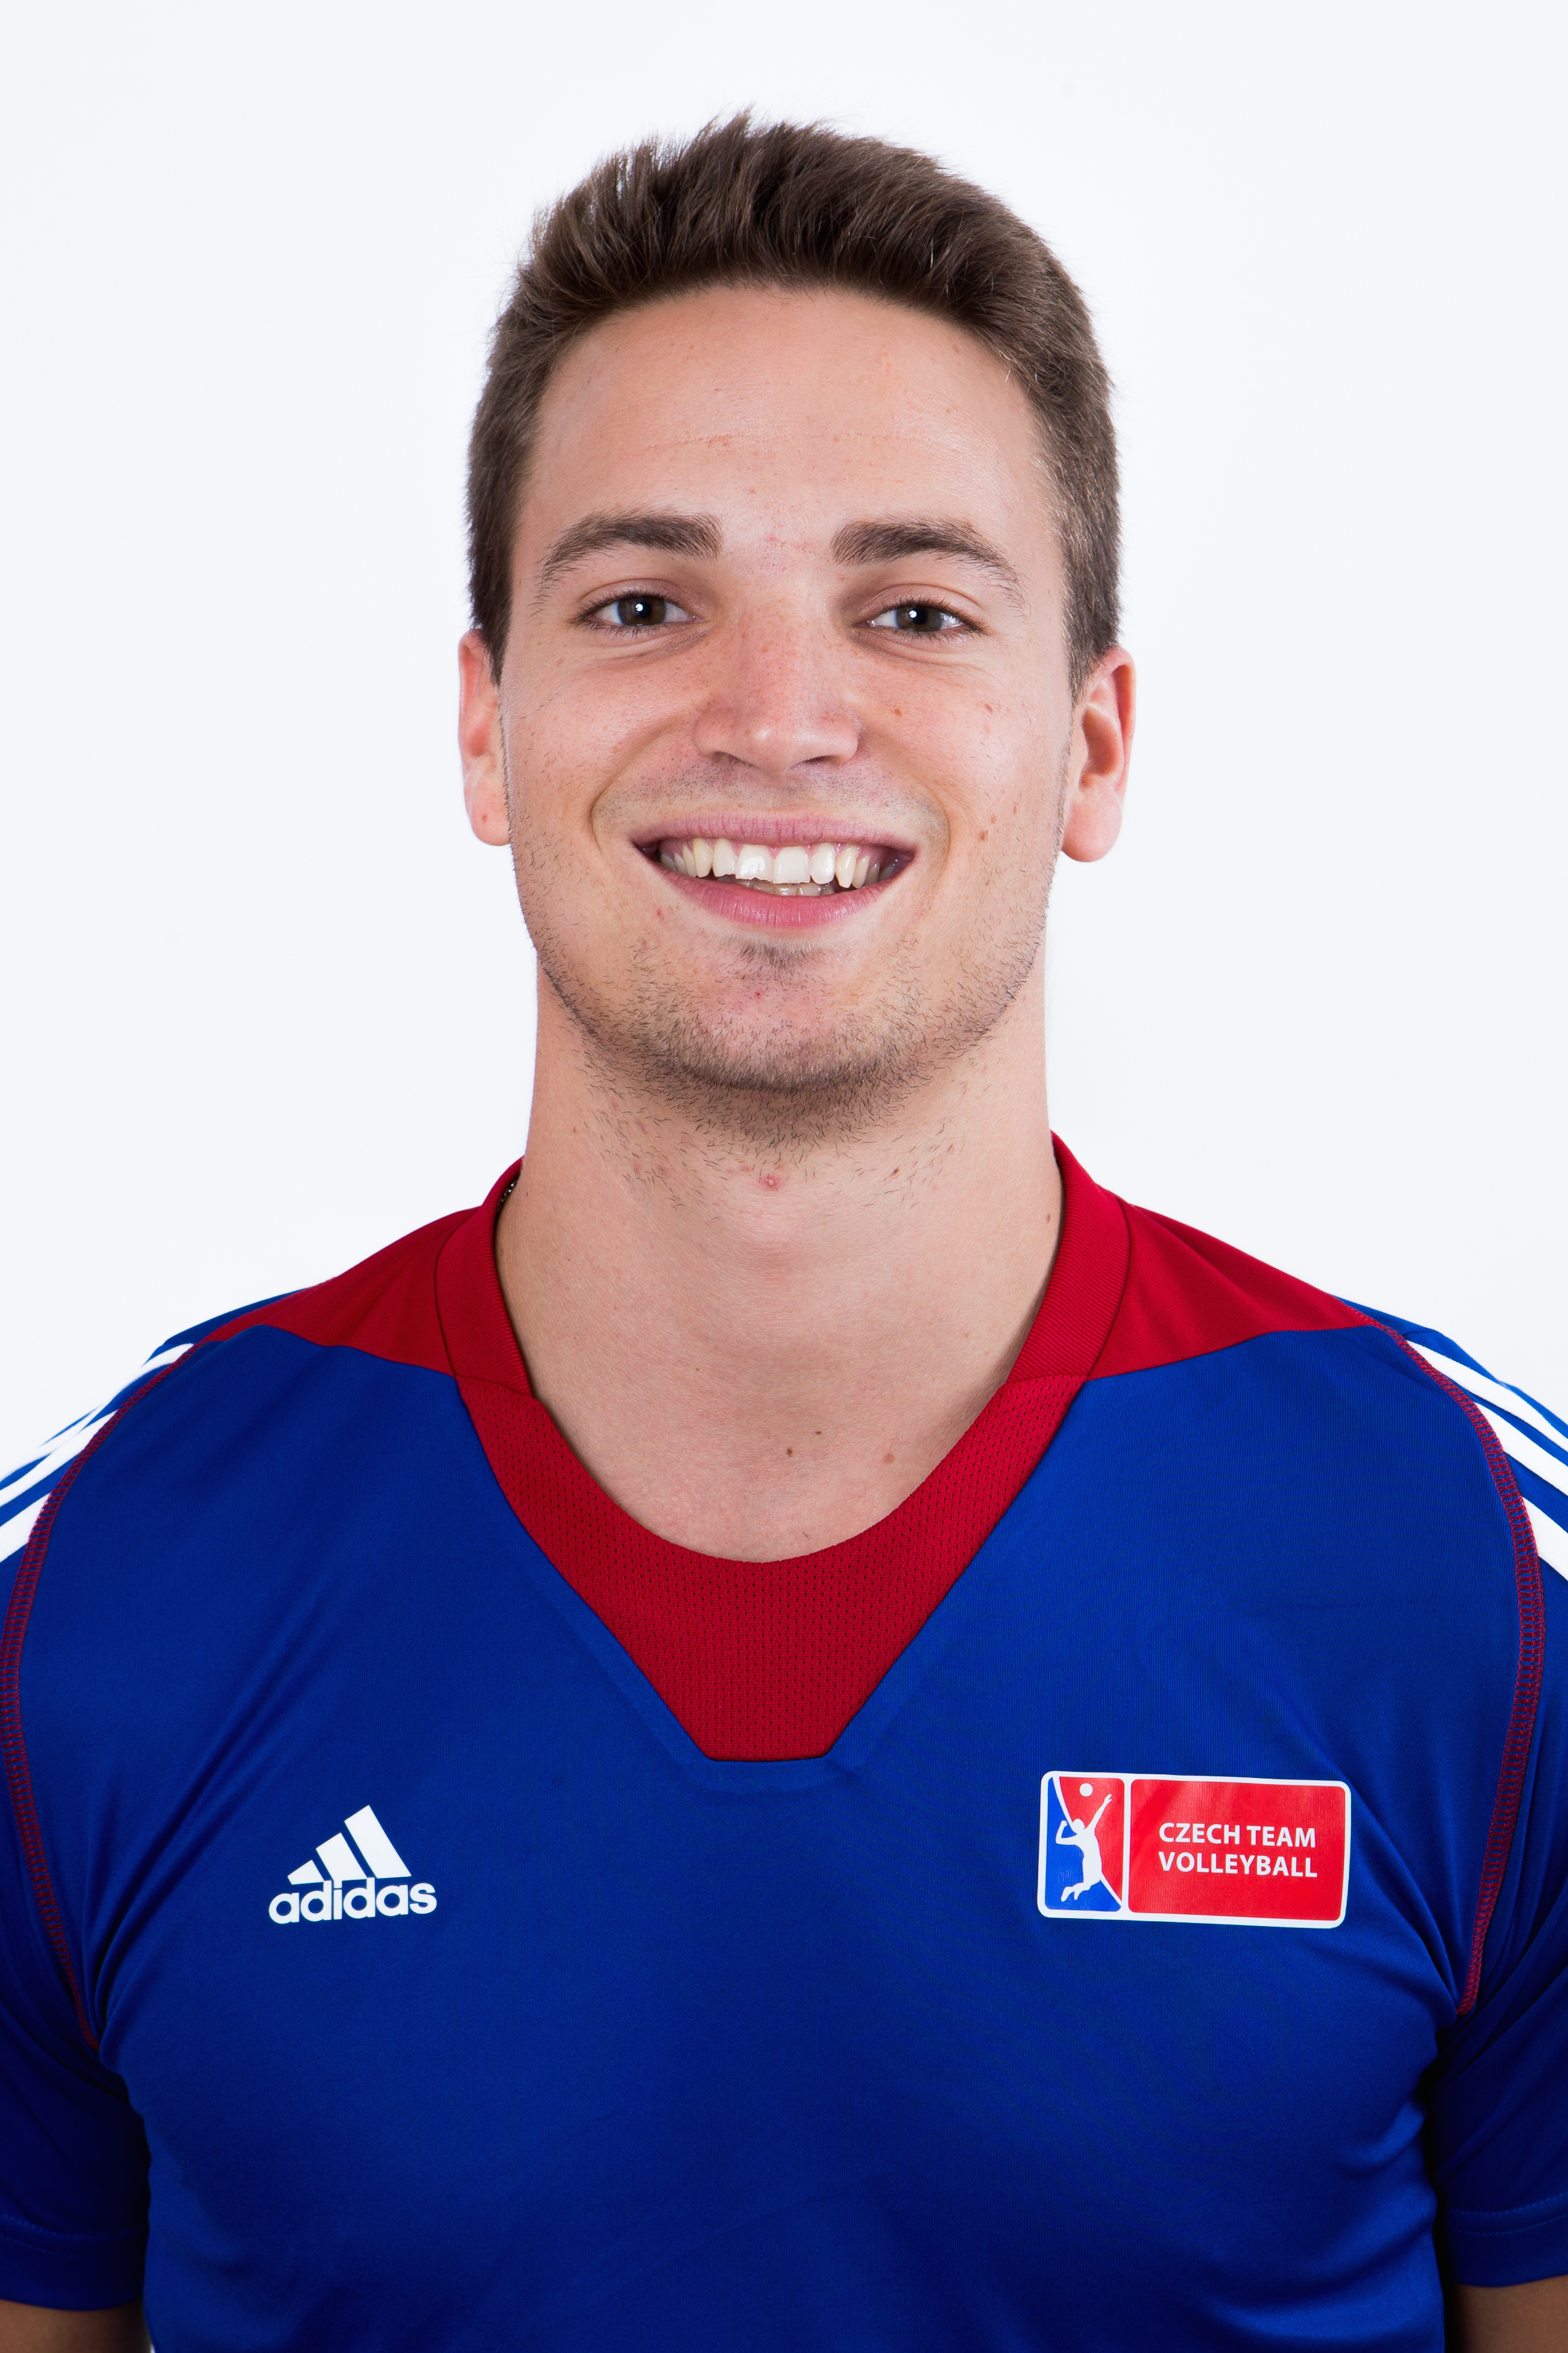 Daniel Pfeffer